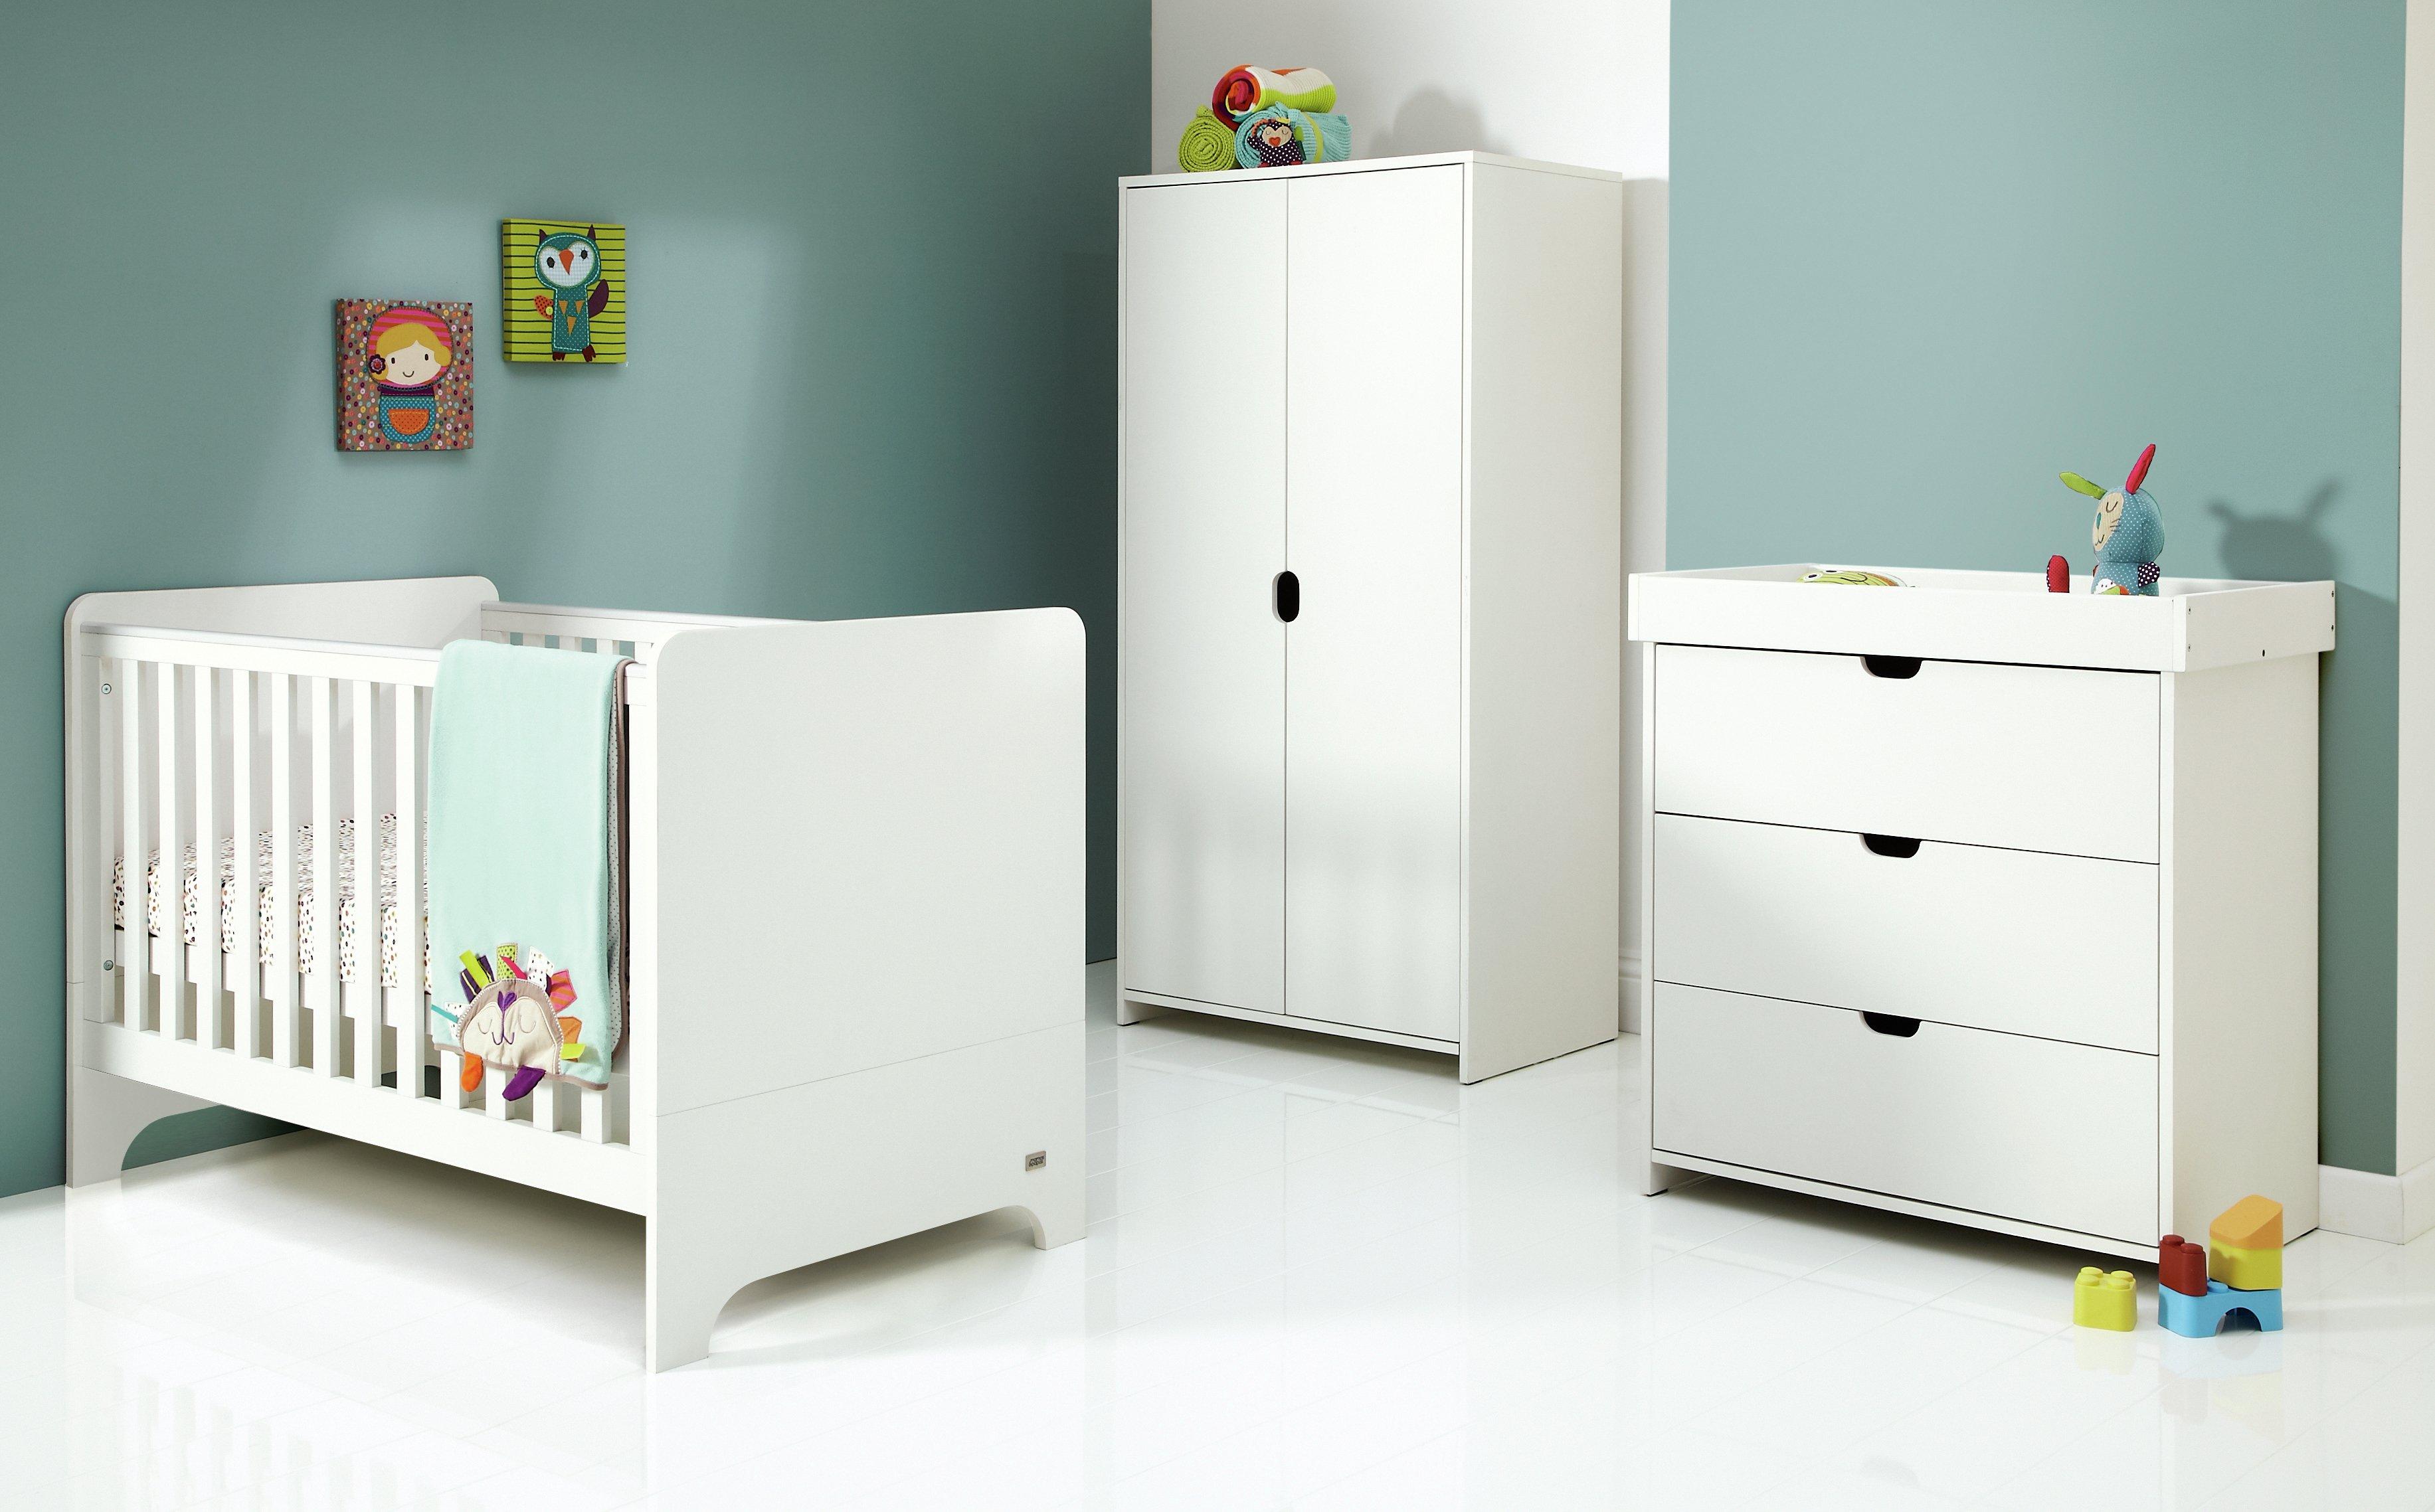 mamas papas rocco 3 piece furniture set review. Black Bedroom Furniture Sets. Home Design Ideas